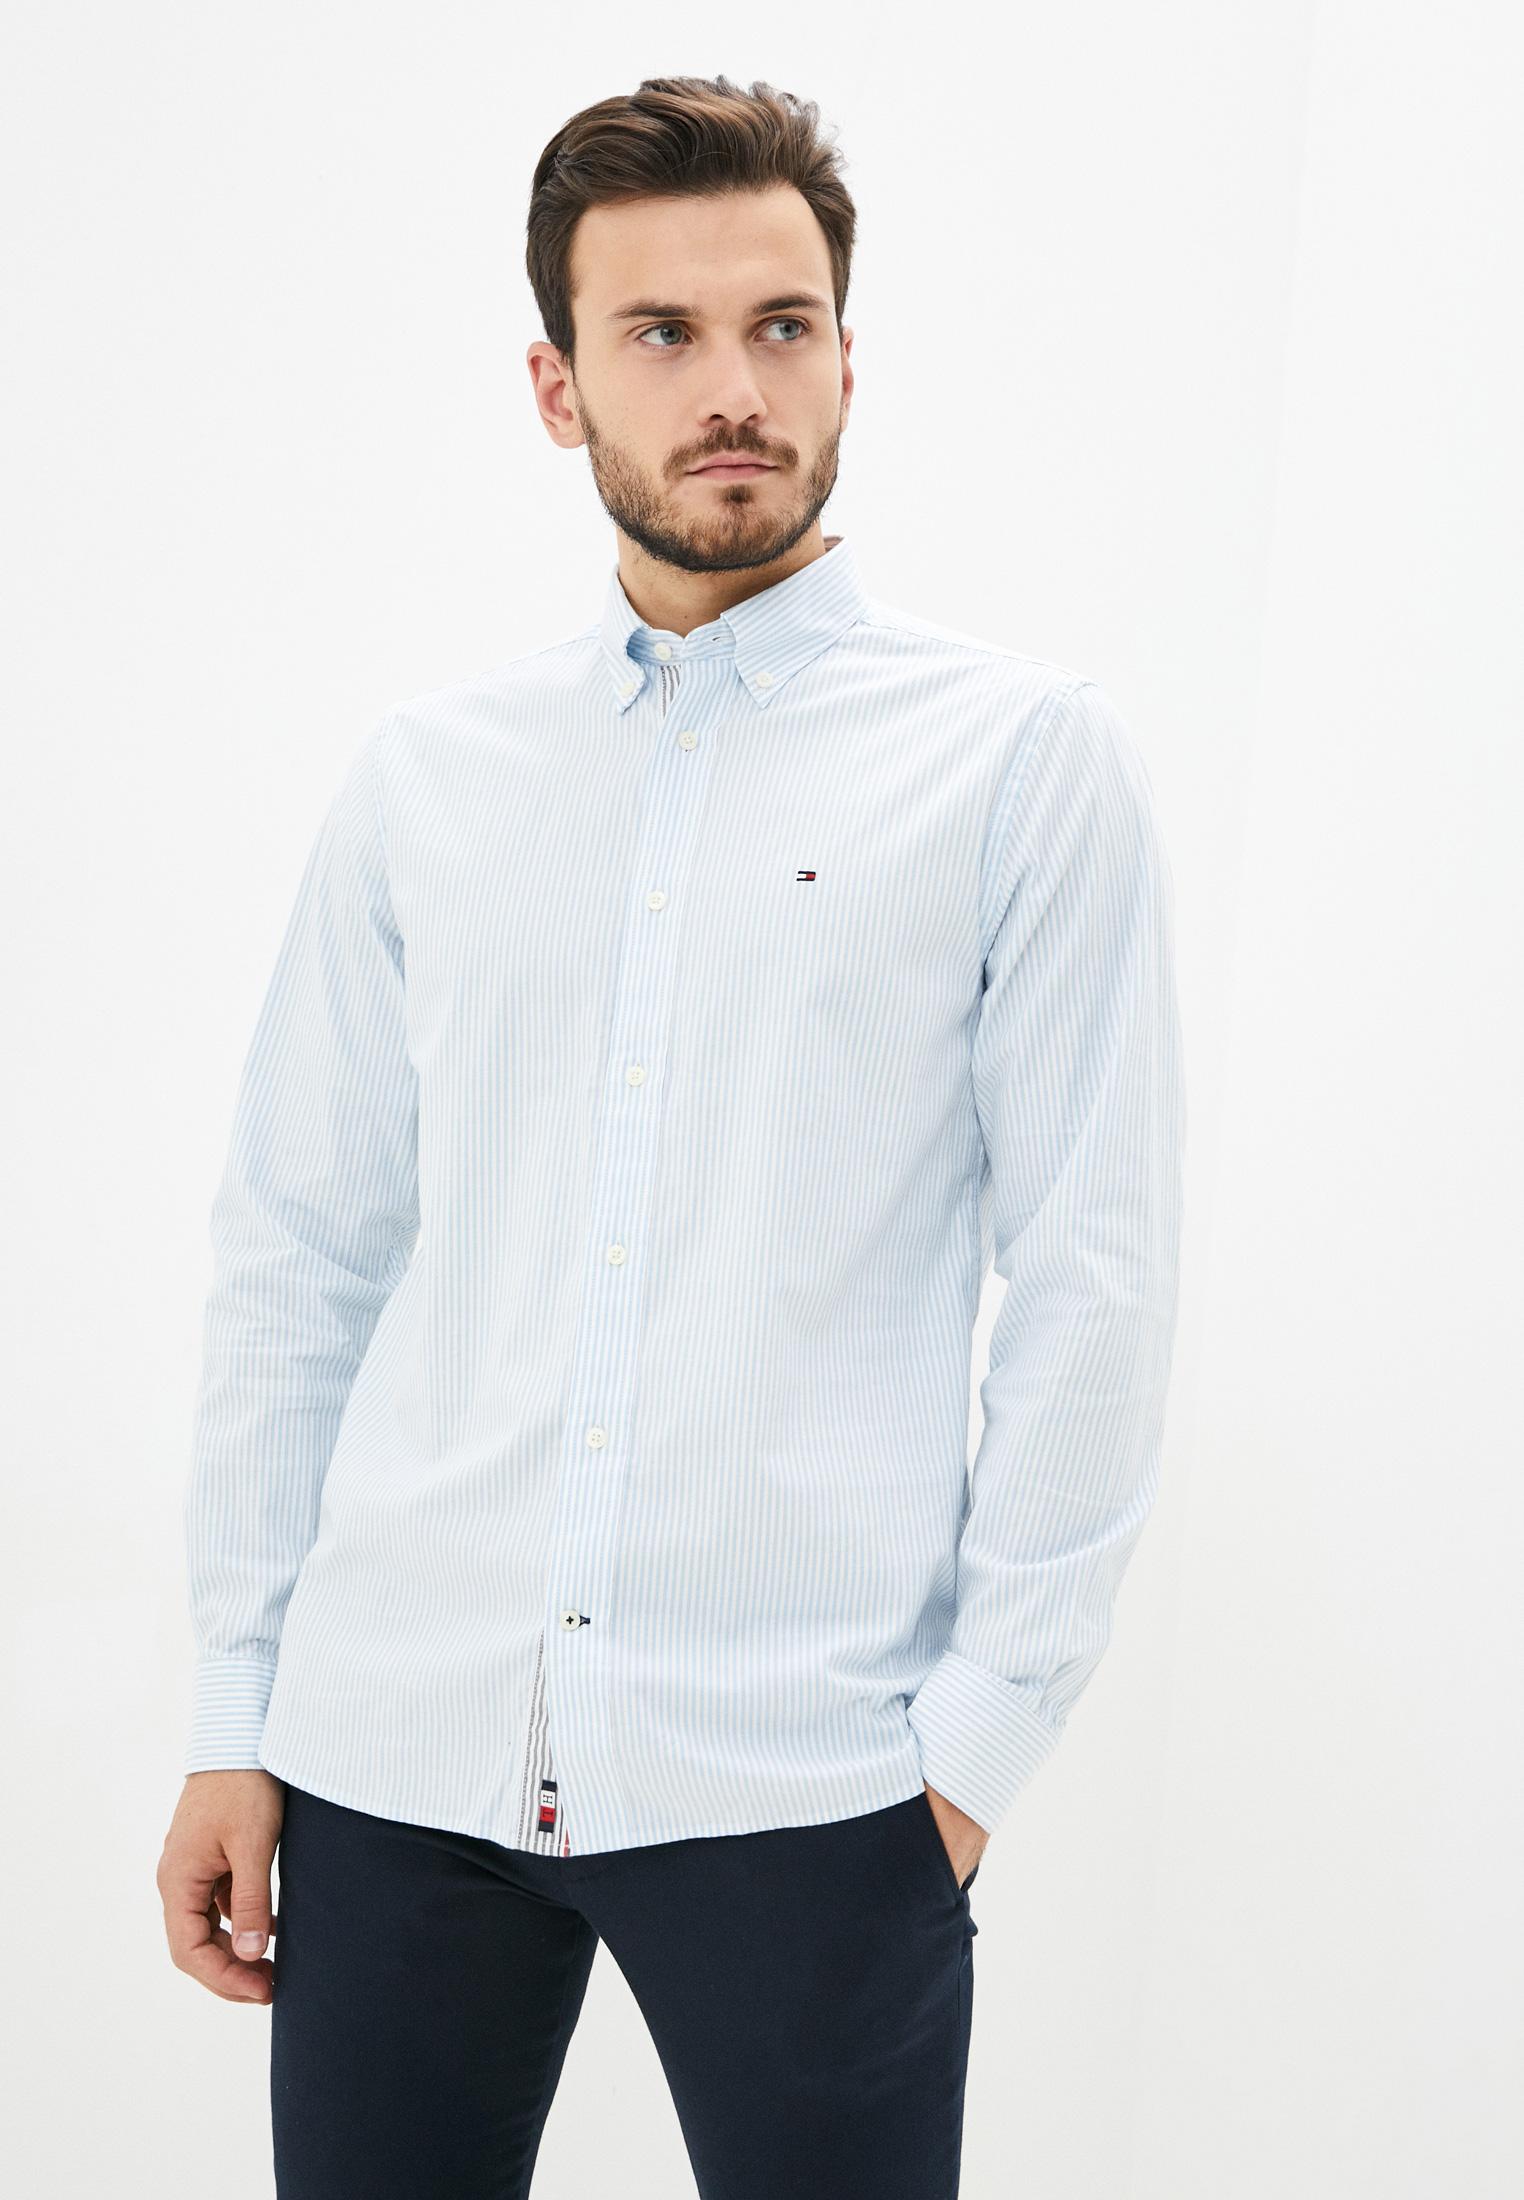 Рубашка с длинным рукавом Tommy Hilfiger (Томми Хилфигер) MW0MW15001